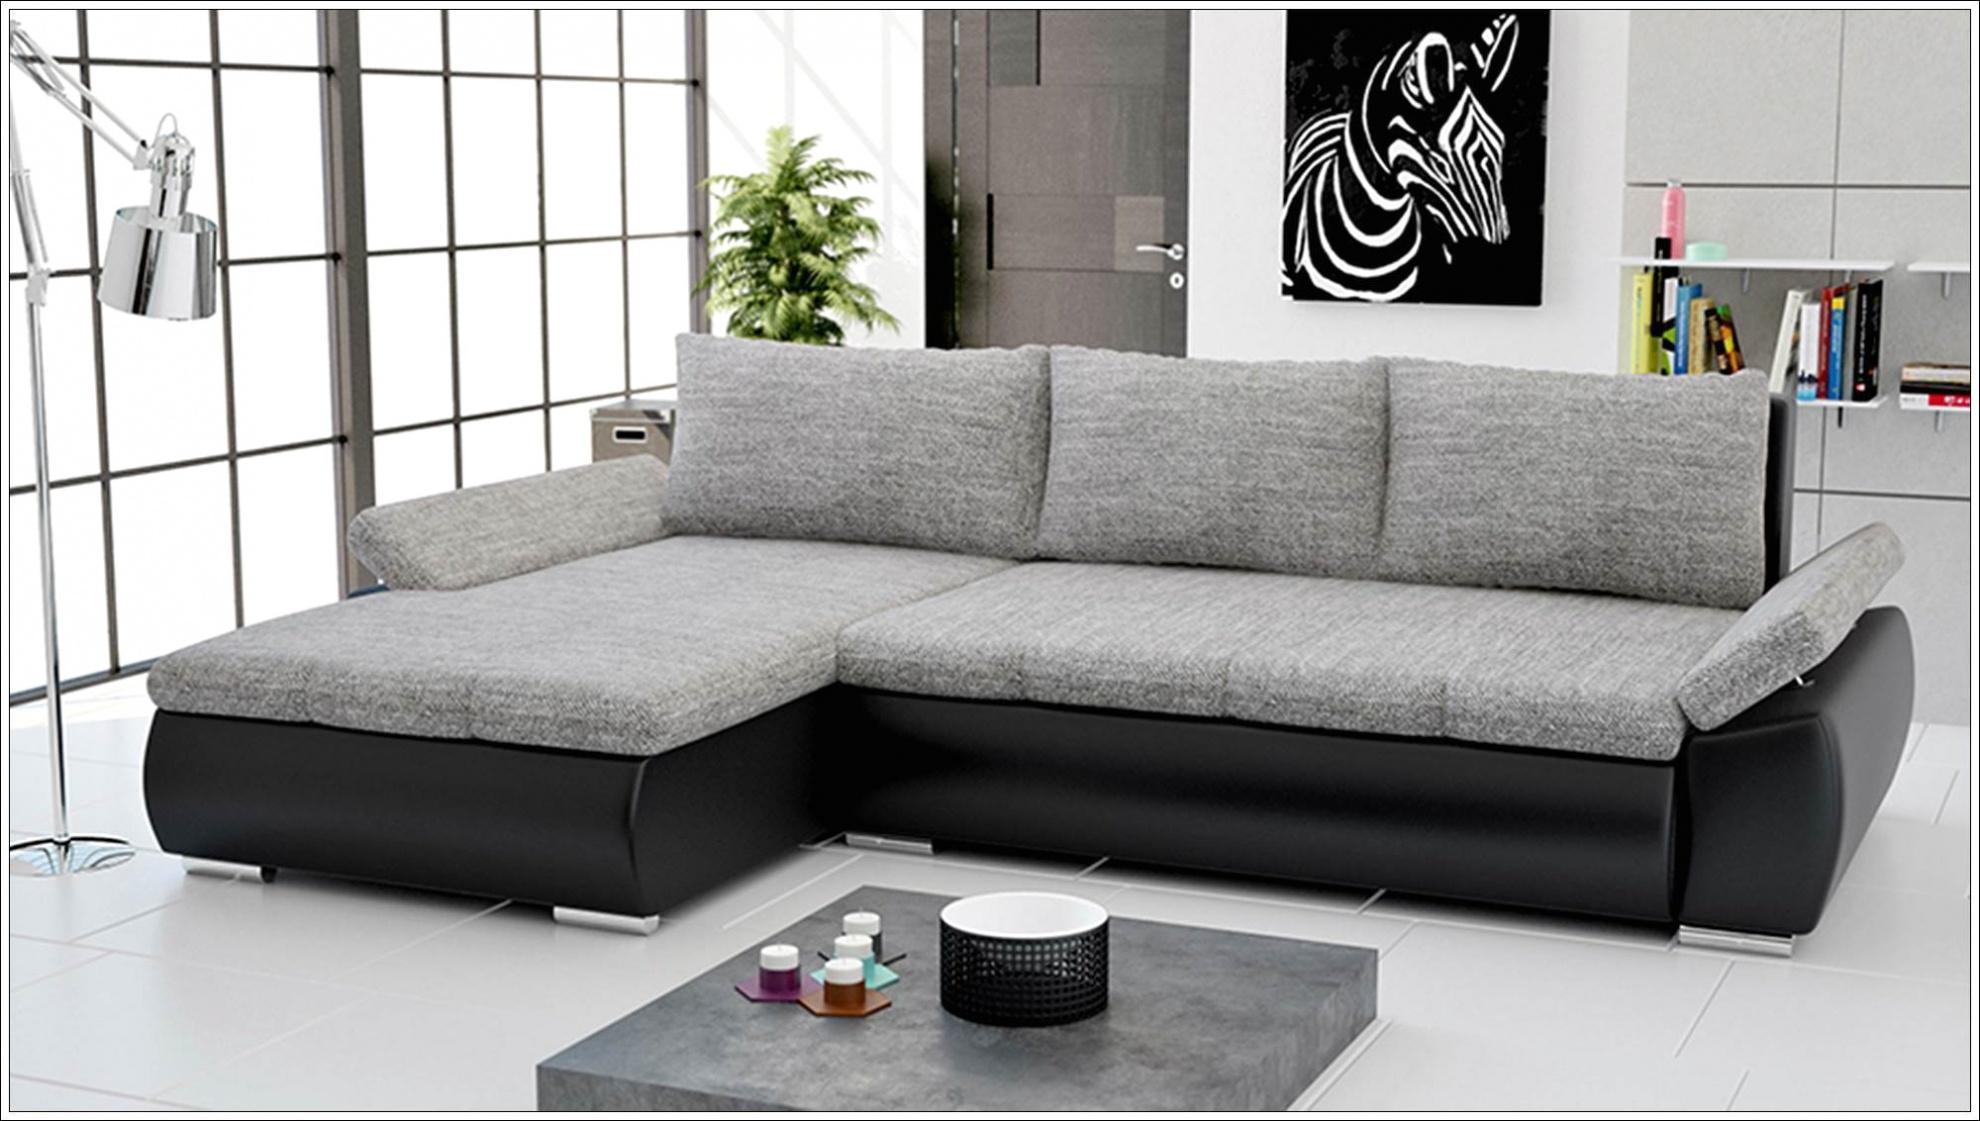 Canapé Angle Ikea Convertible Beau Photos Maha S Canapé Convertible Moderne Thuis Mahagranda